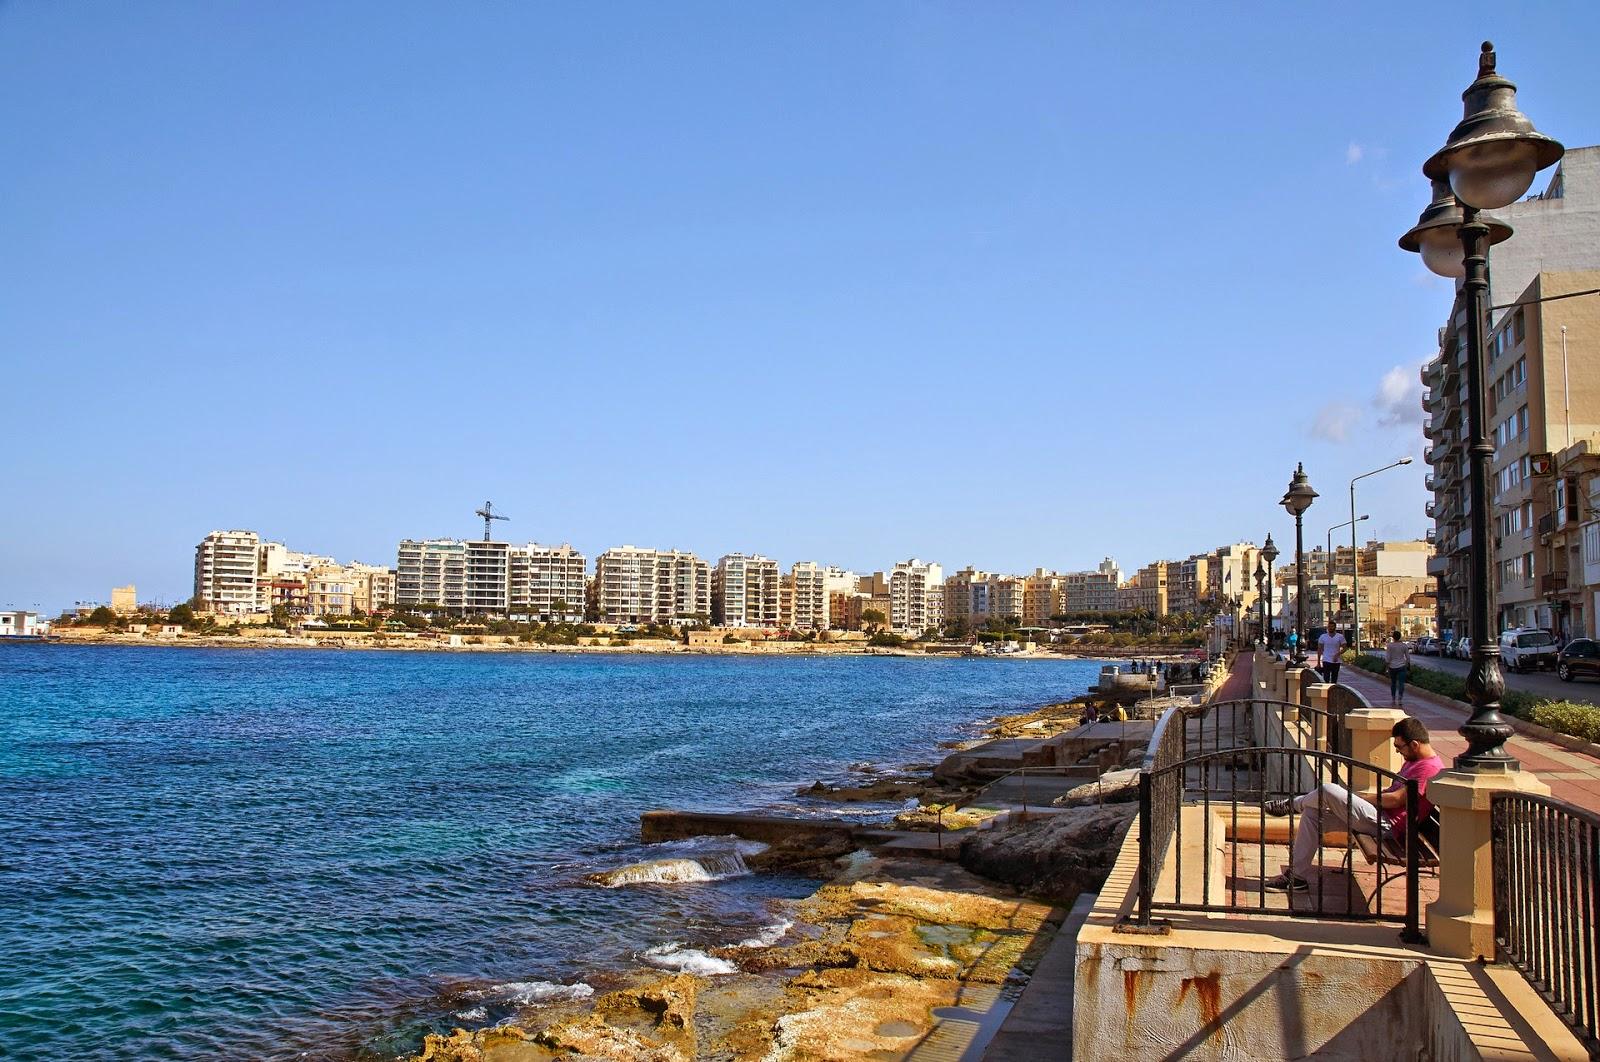 apartamenty nad brzegiem morza Malta